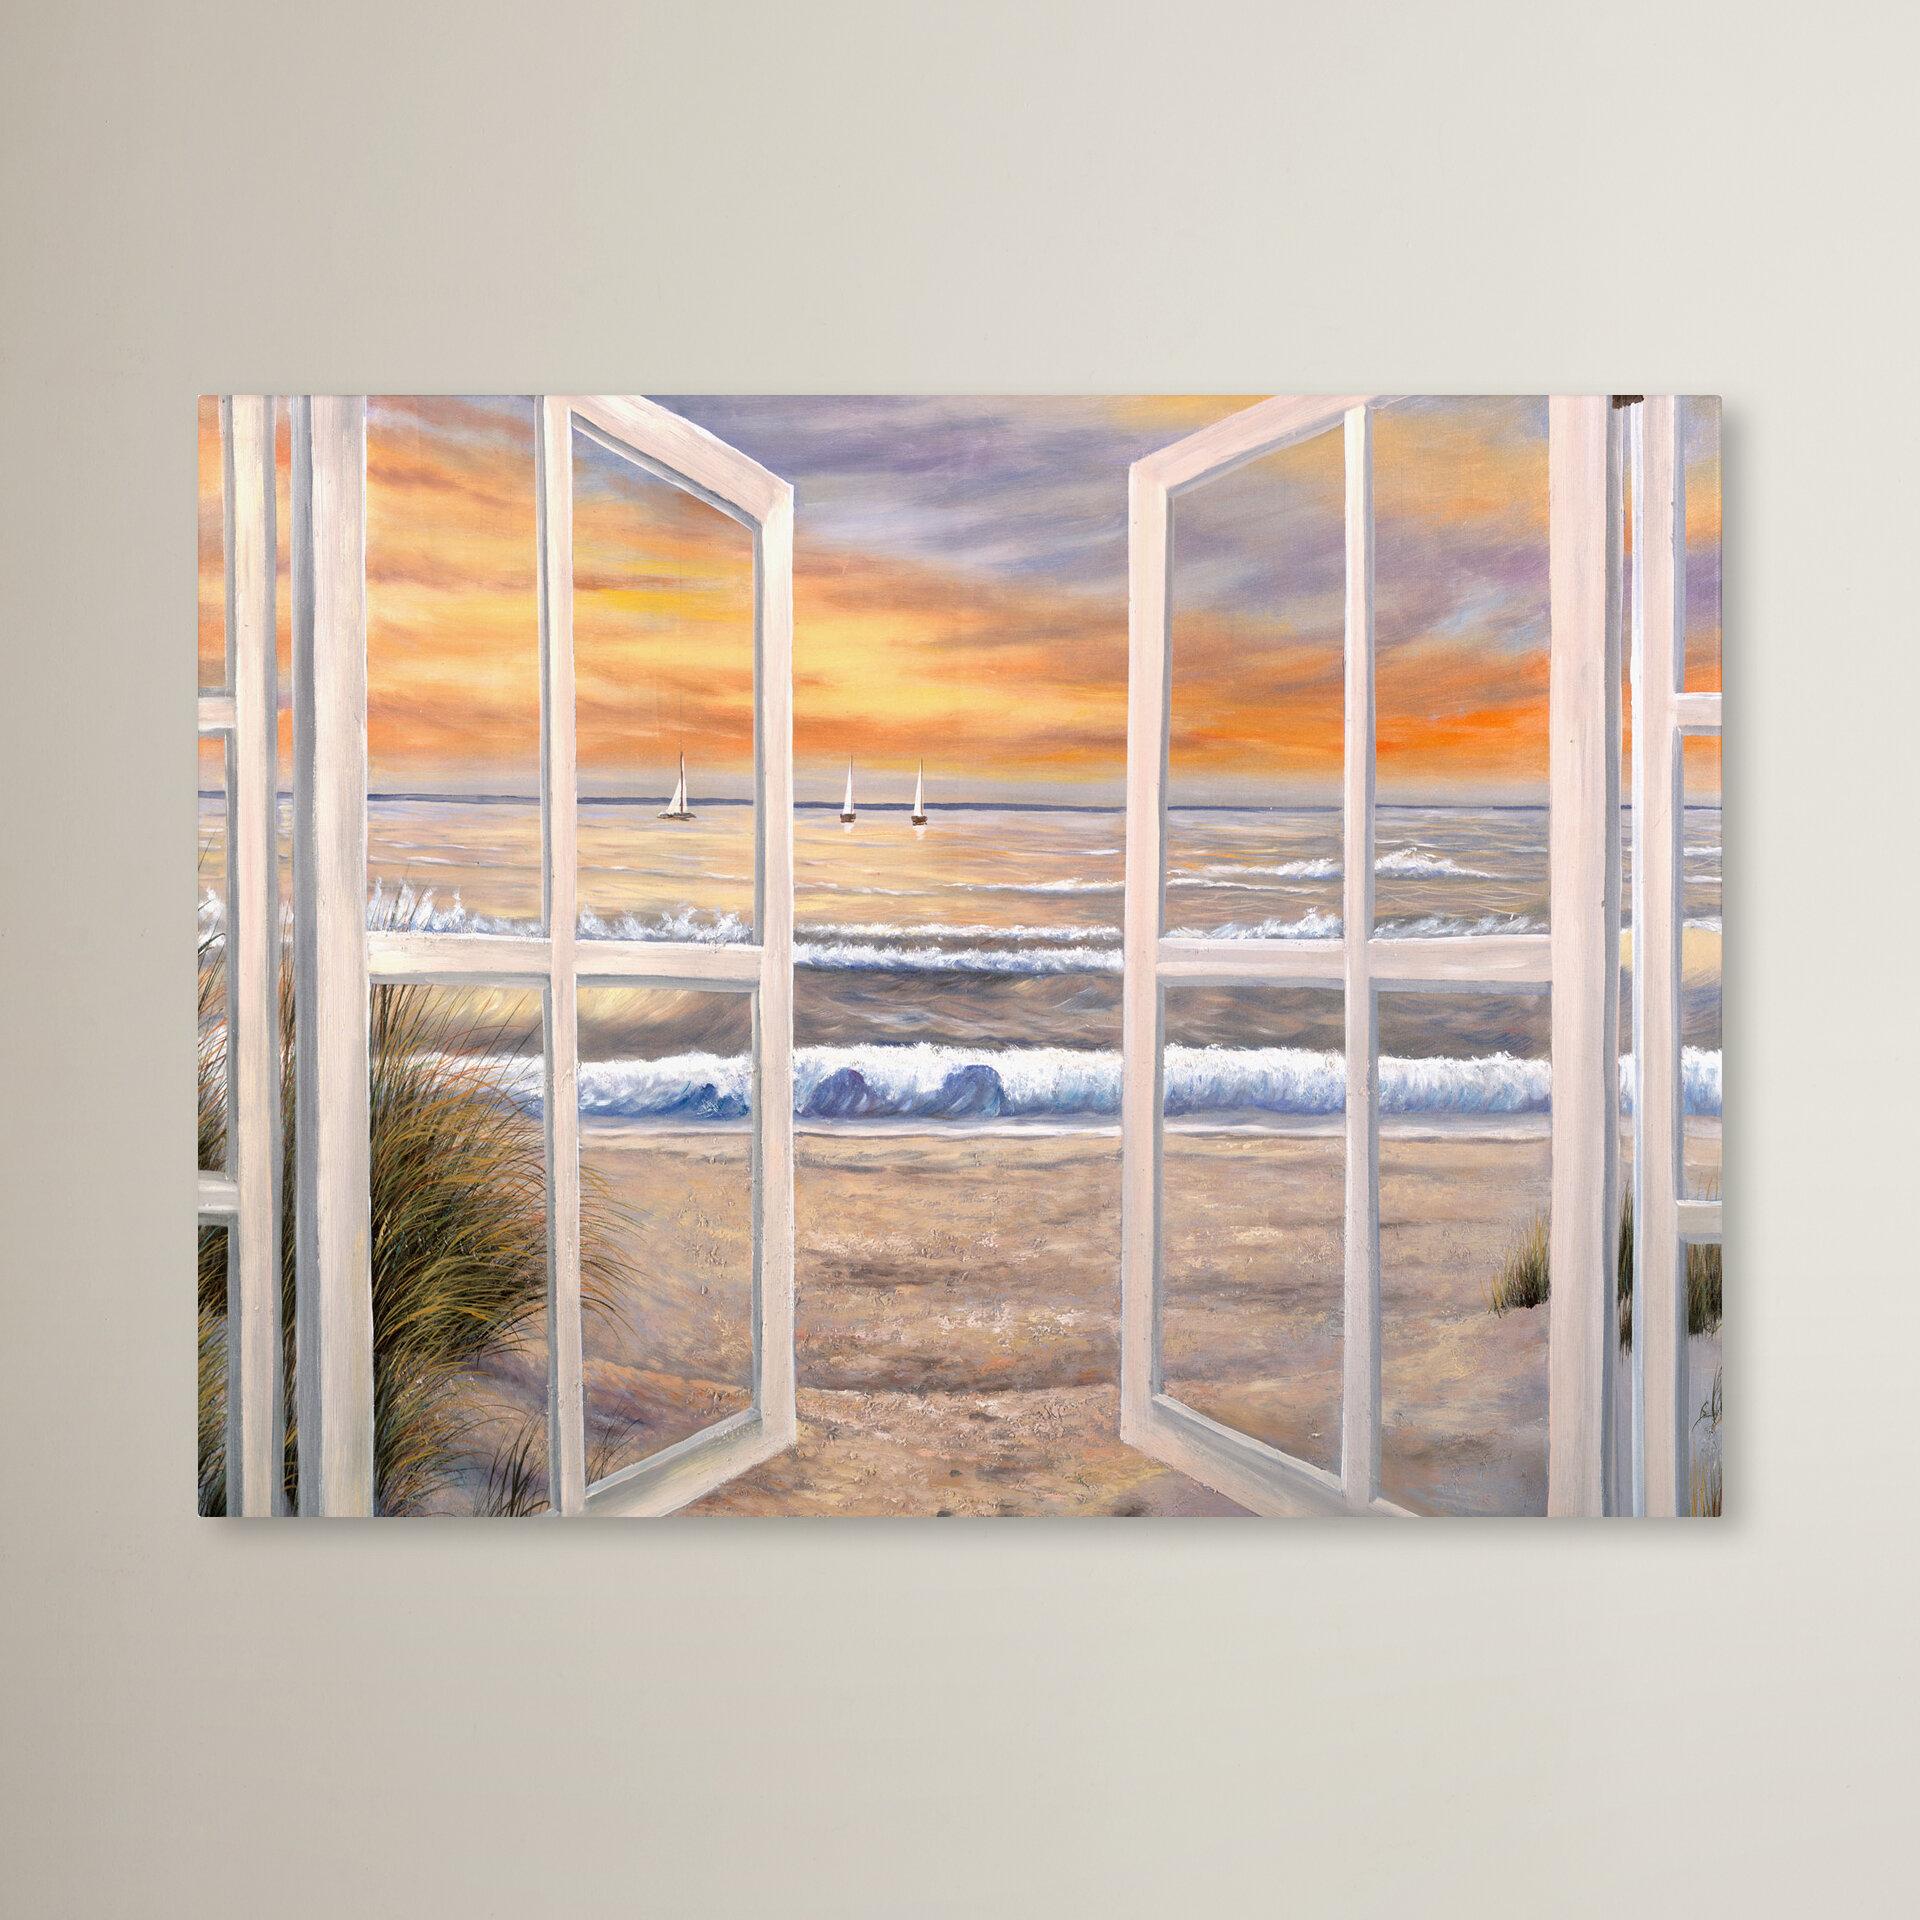 Trademark Global Elongated Window Painting Print On Canvas Reviews Wayfair